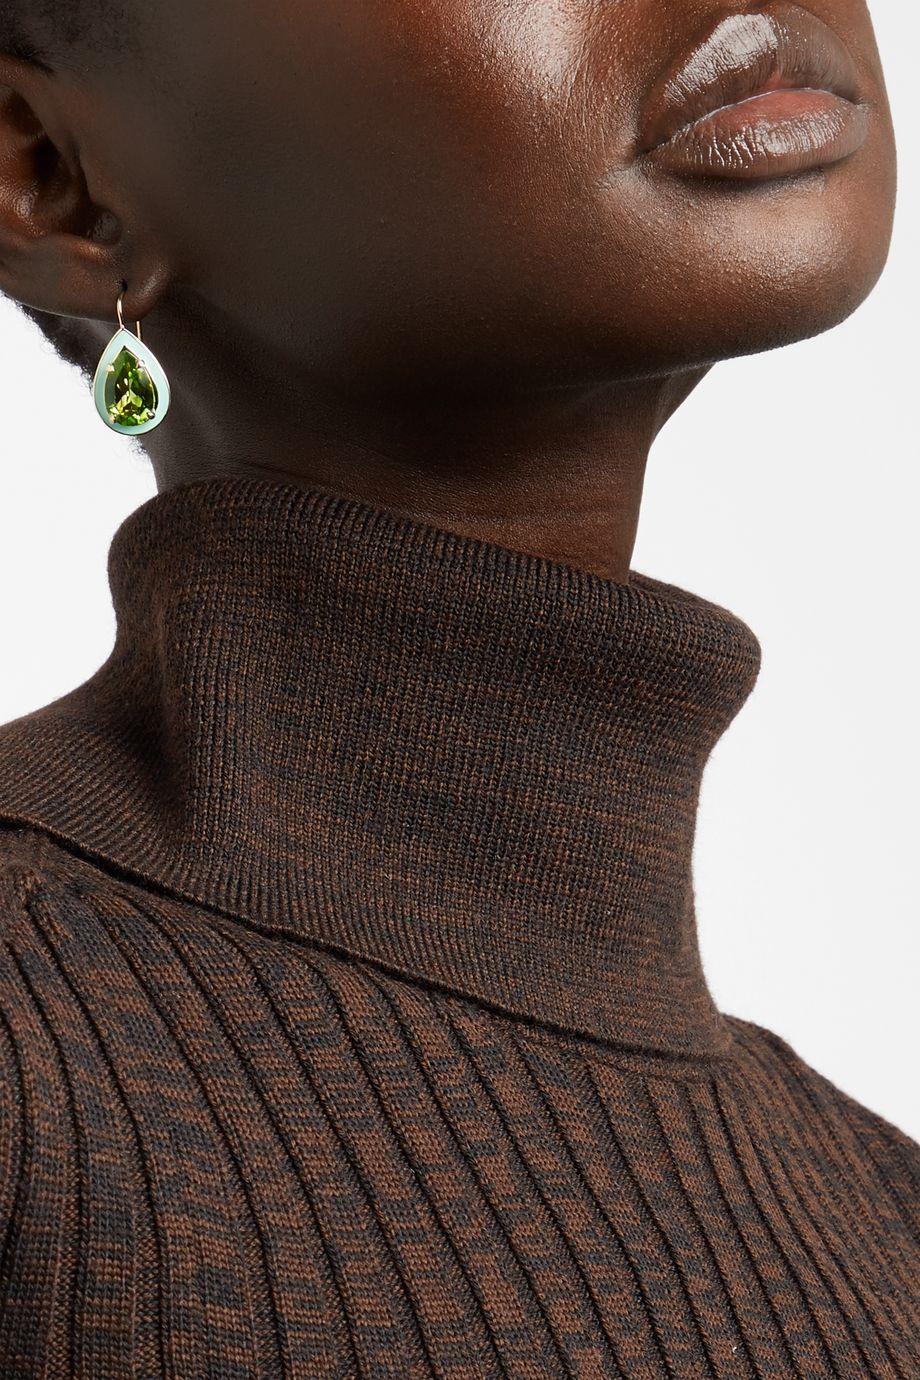 Alison Lou Cocktail 14-karat gold, enamel and peridot earrings